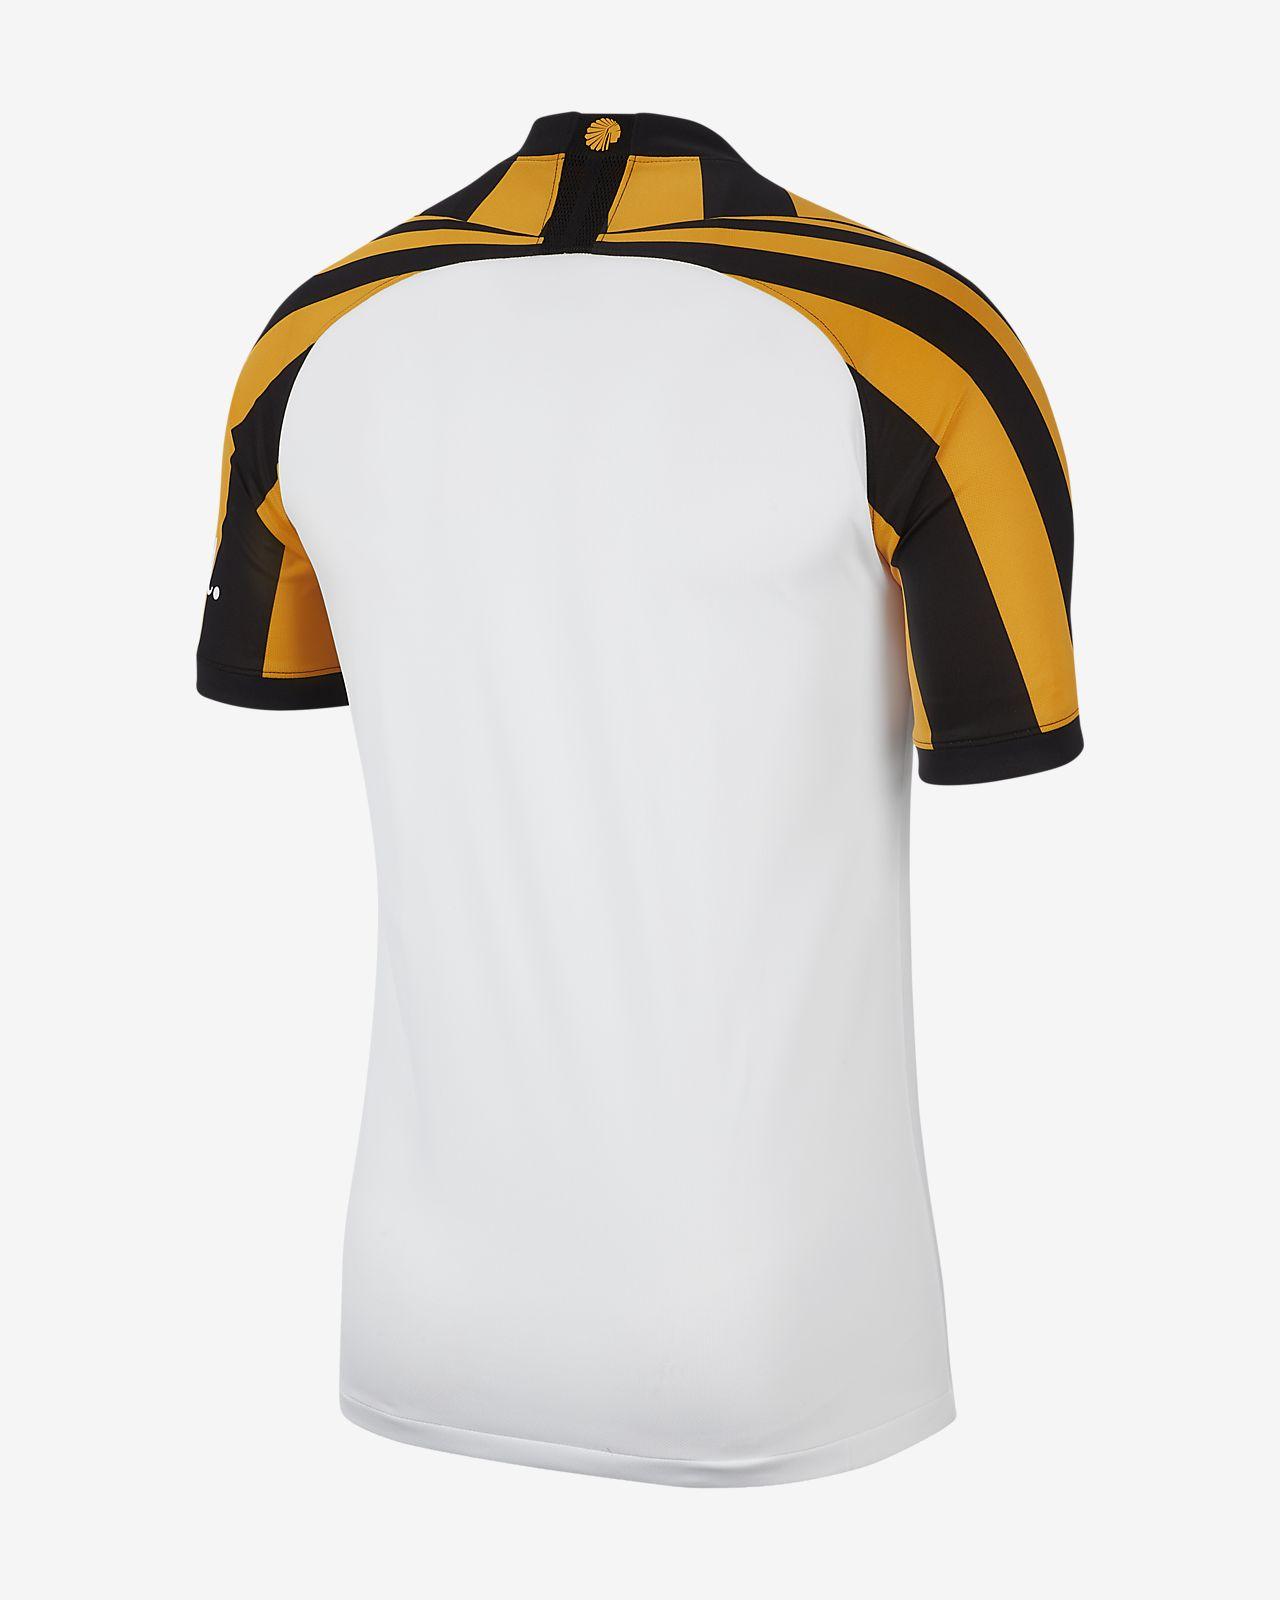 Camiseta Fútbol c201920 Stadium Kaizer Chiefs De F Hombre Para Visitante Owv0m8Nn